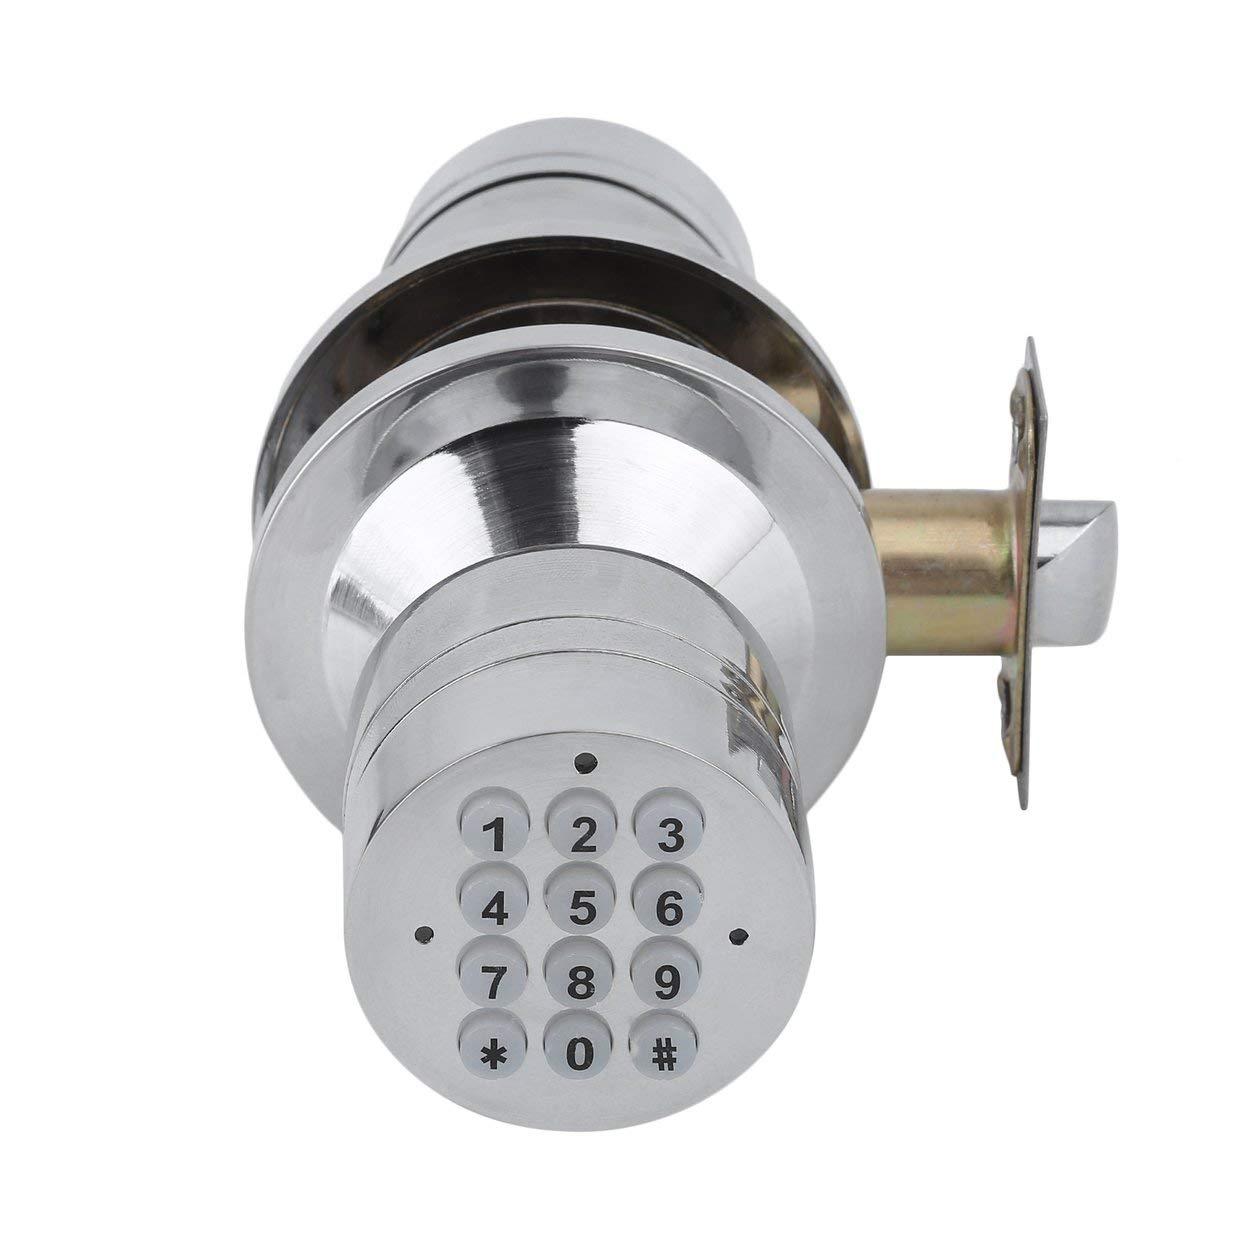 Keyless Electronic Code Password Number Lock Digital Keyless Keypad Security Safety Entry Intelligent Doorlock Silver by ToGames (Image #5)